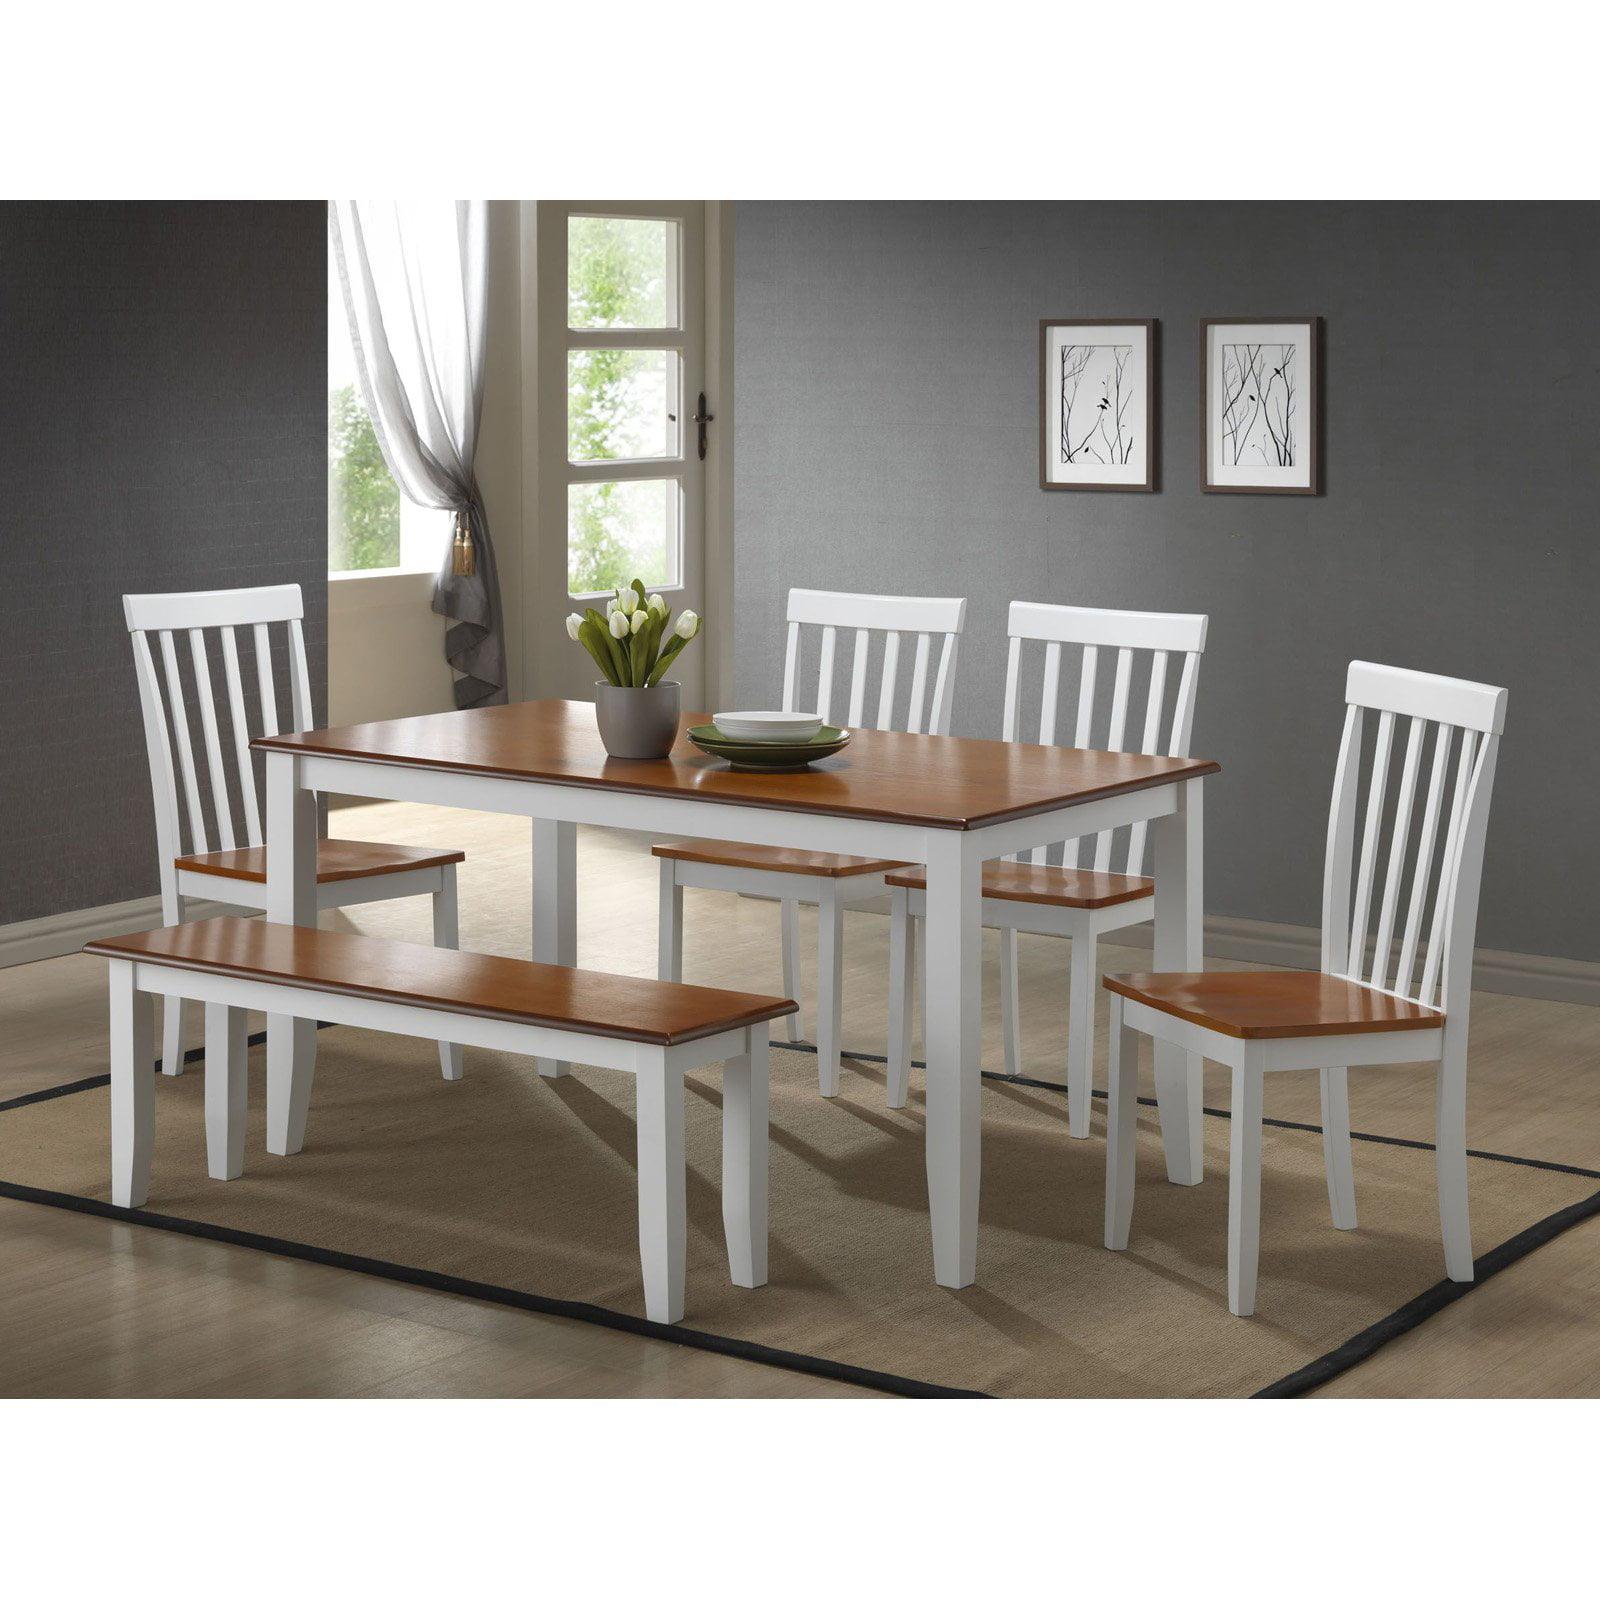 Boraam Bloomington 6 Piece Dining Room Set with Bench White & Honey Oak by Boraam Industries LLC